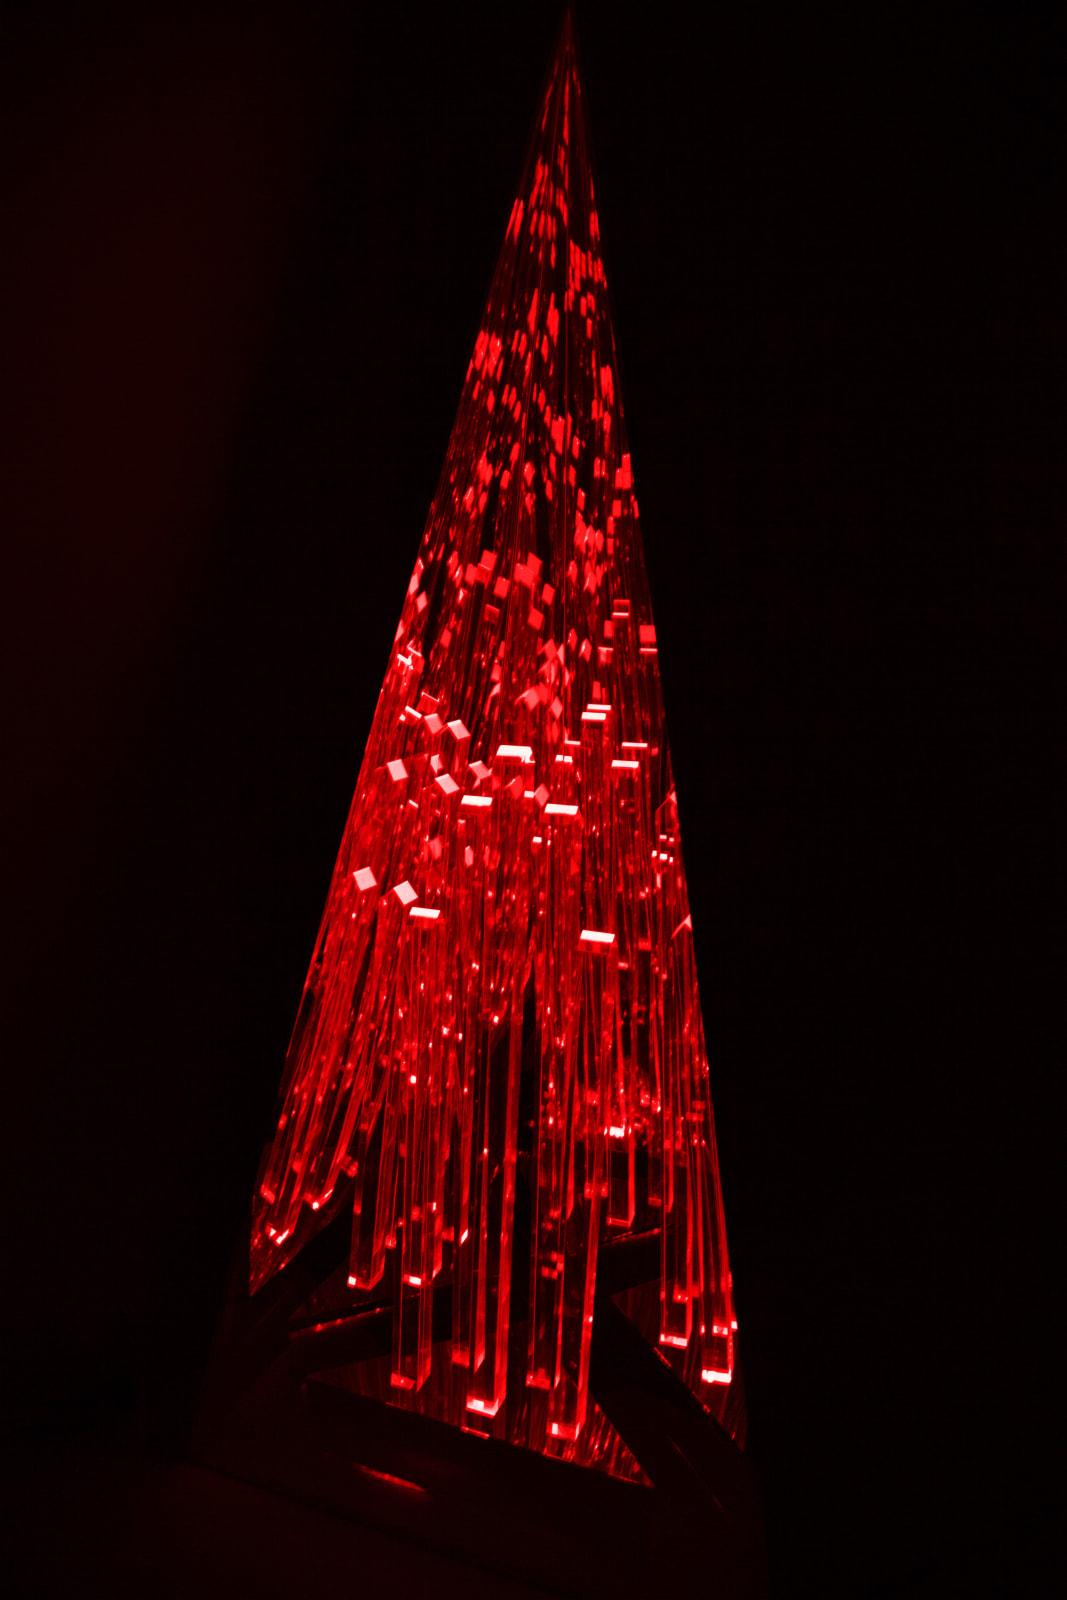 Cristal Castle Red